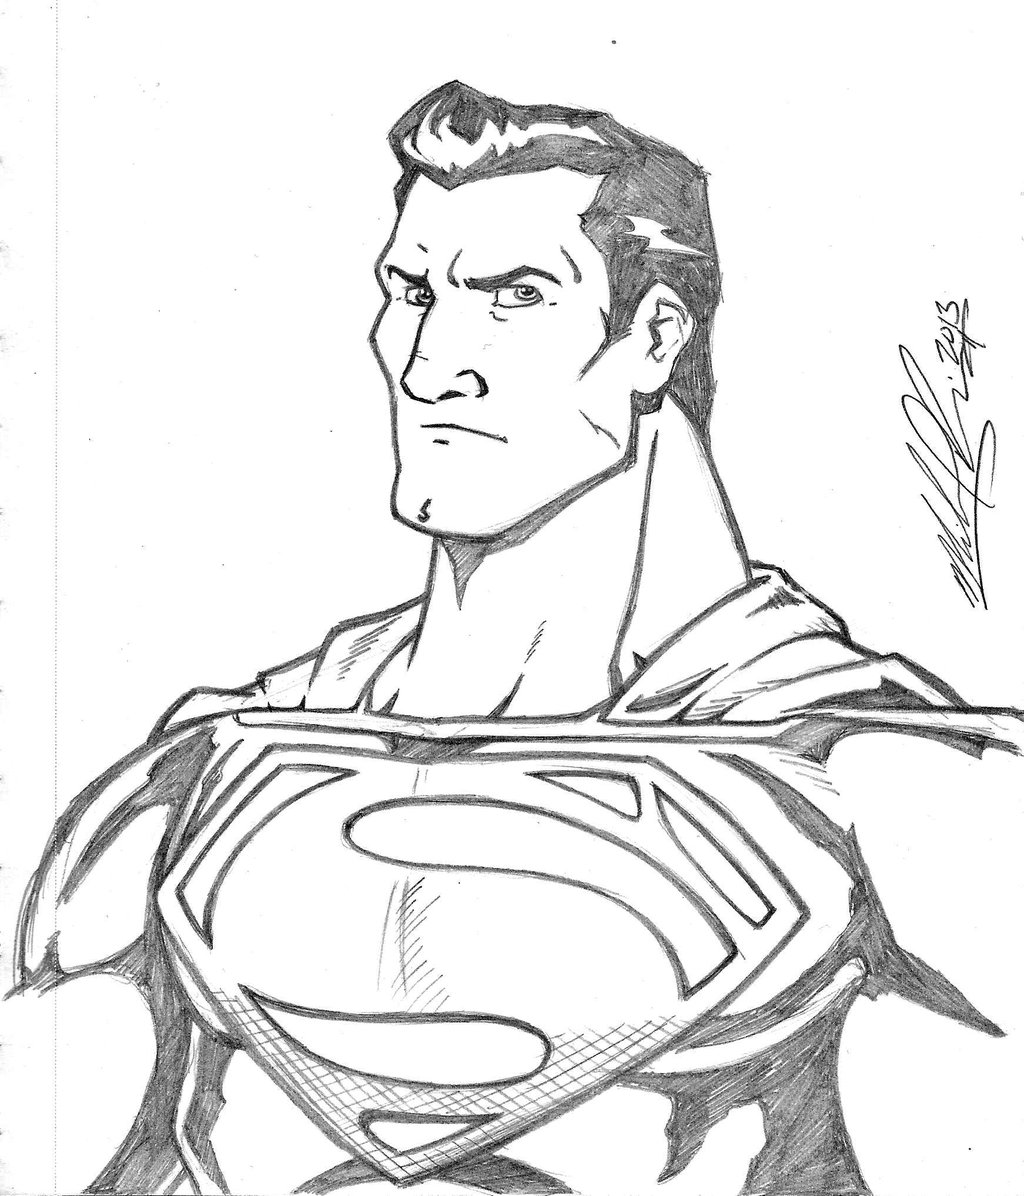 1024x1196 Man of Steel pencil sketch by mikereisner on DeviantArt